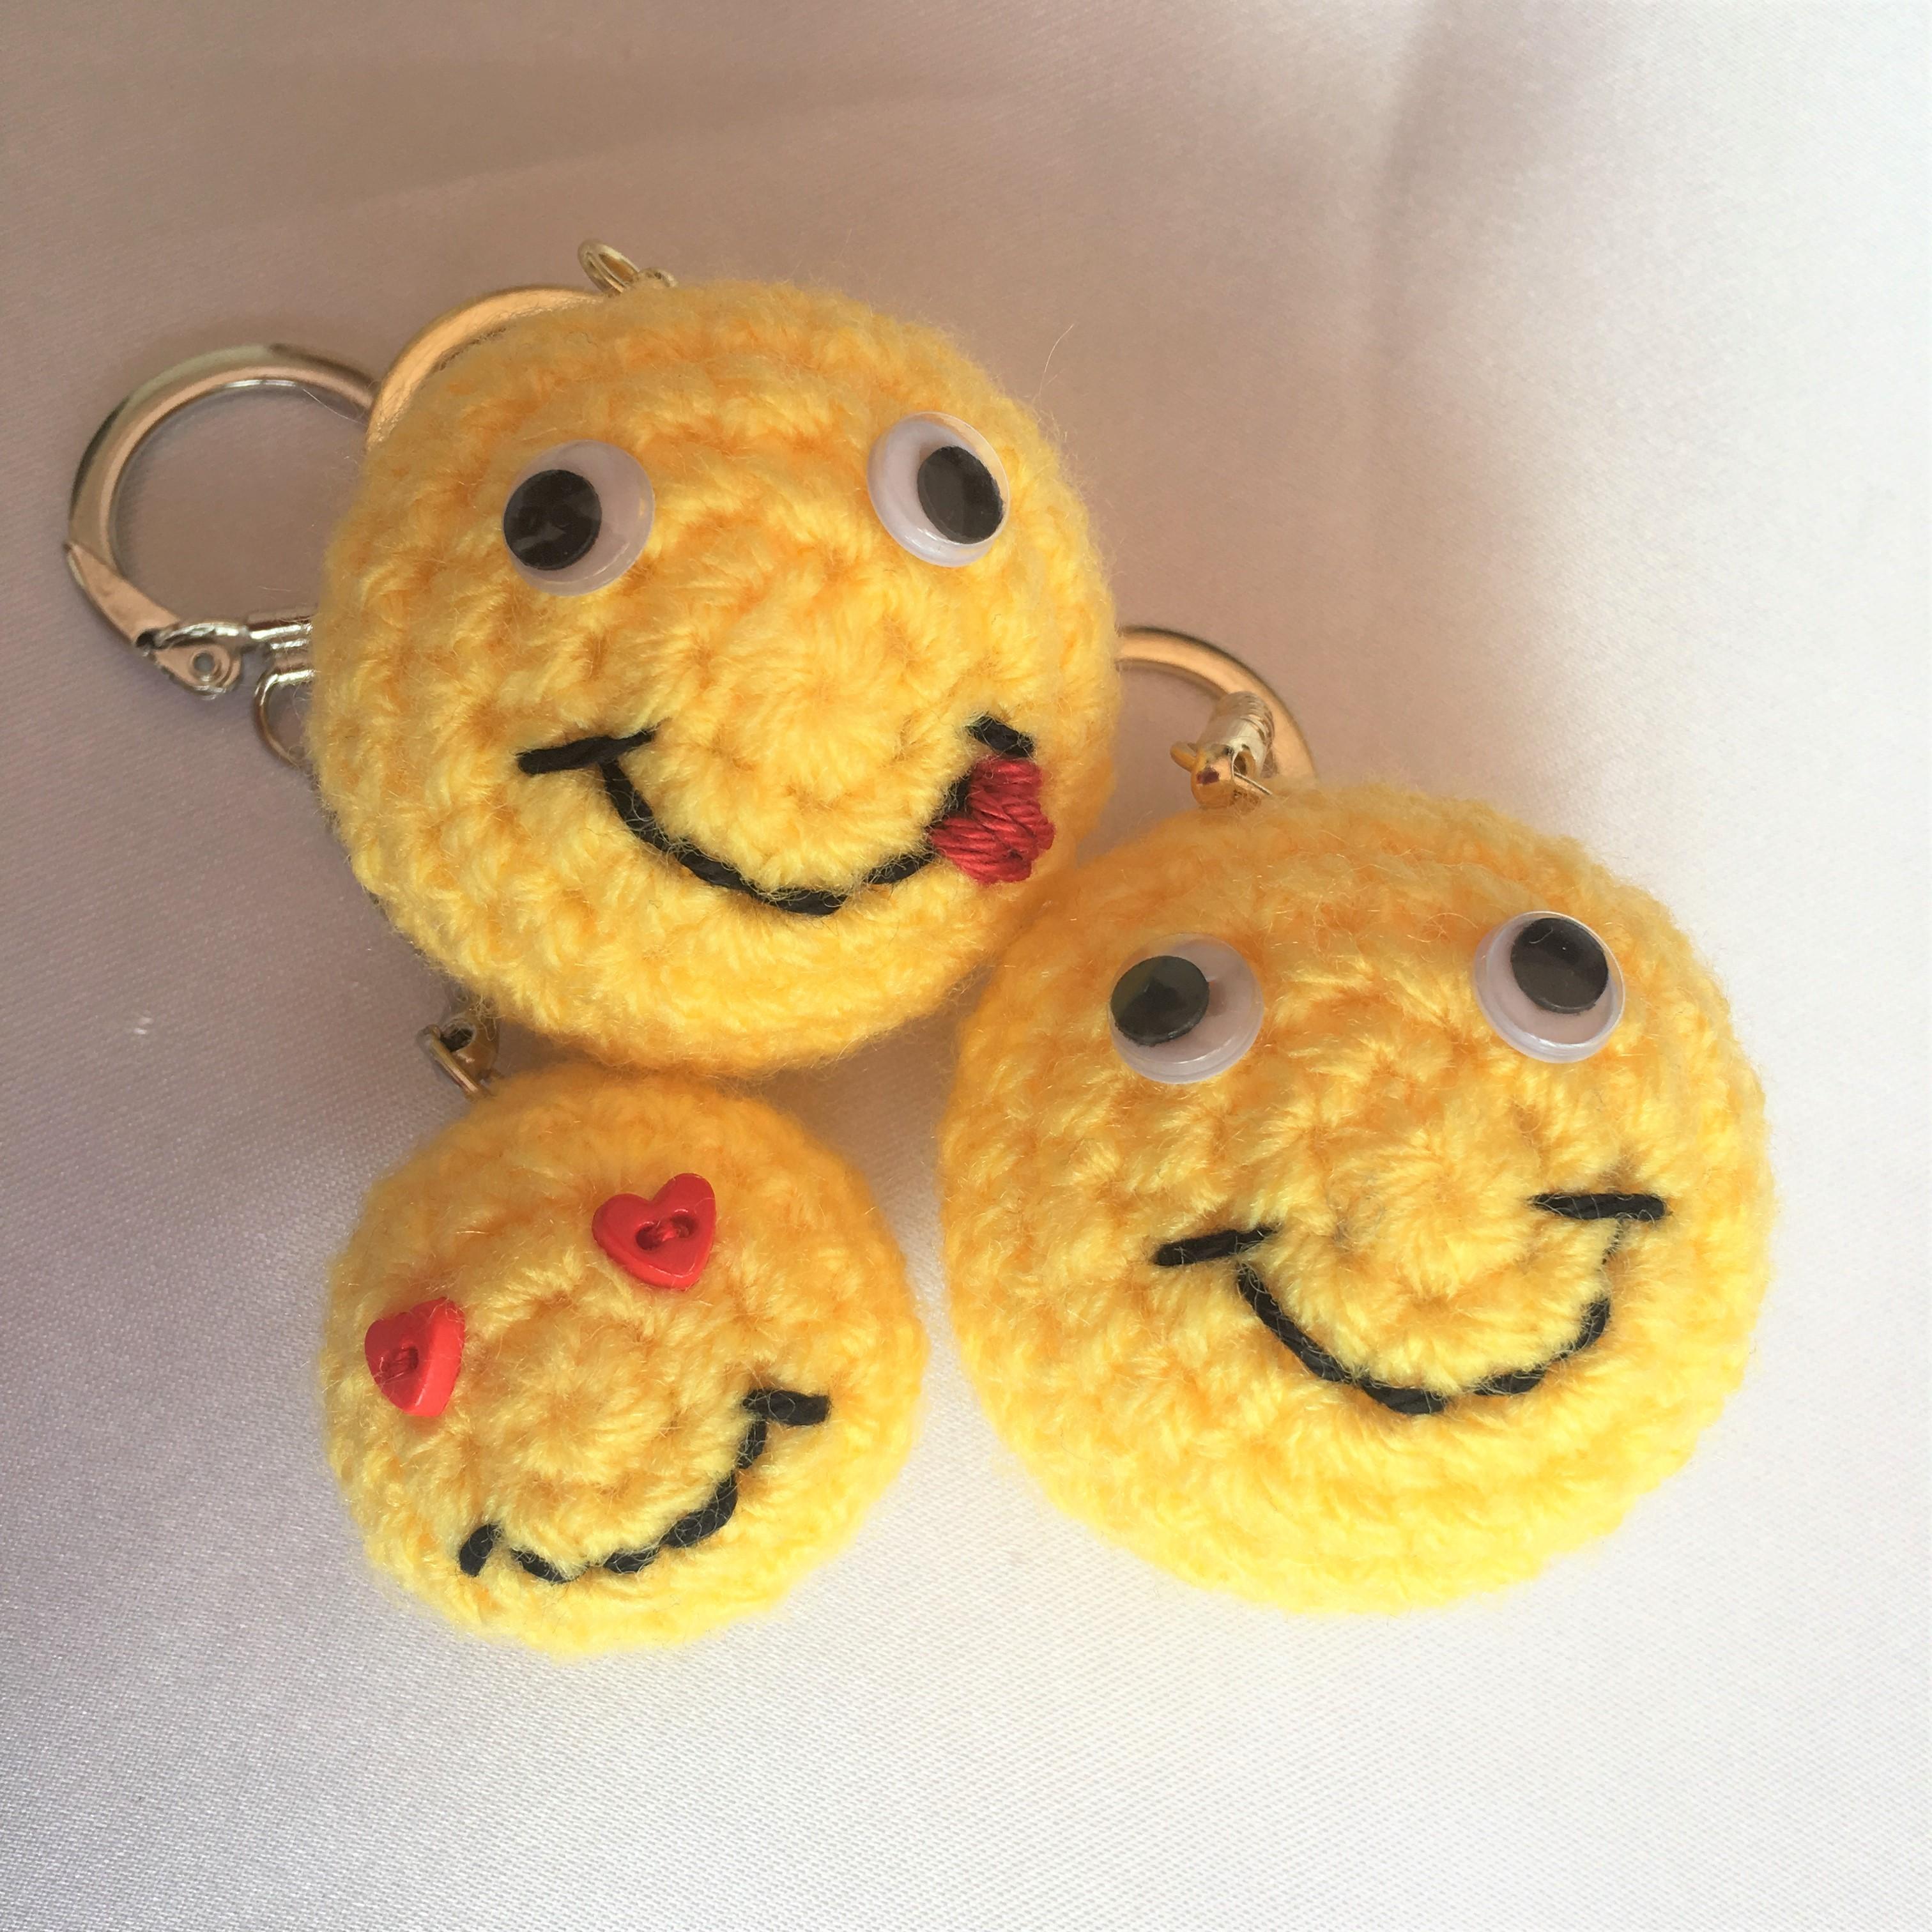 258 Smiley Keyring